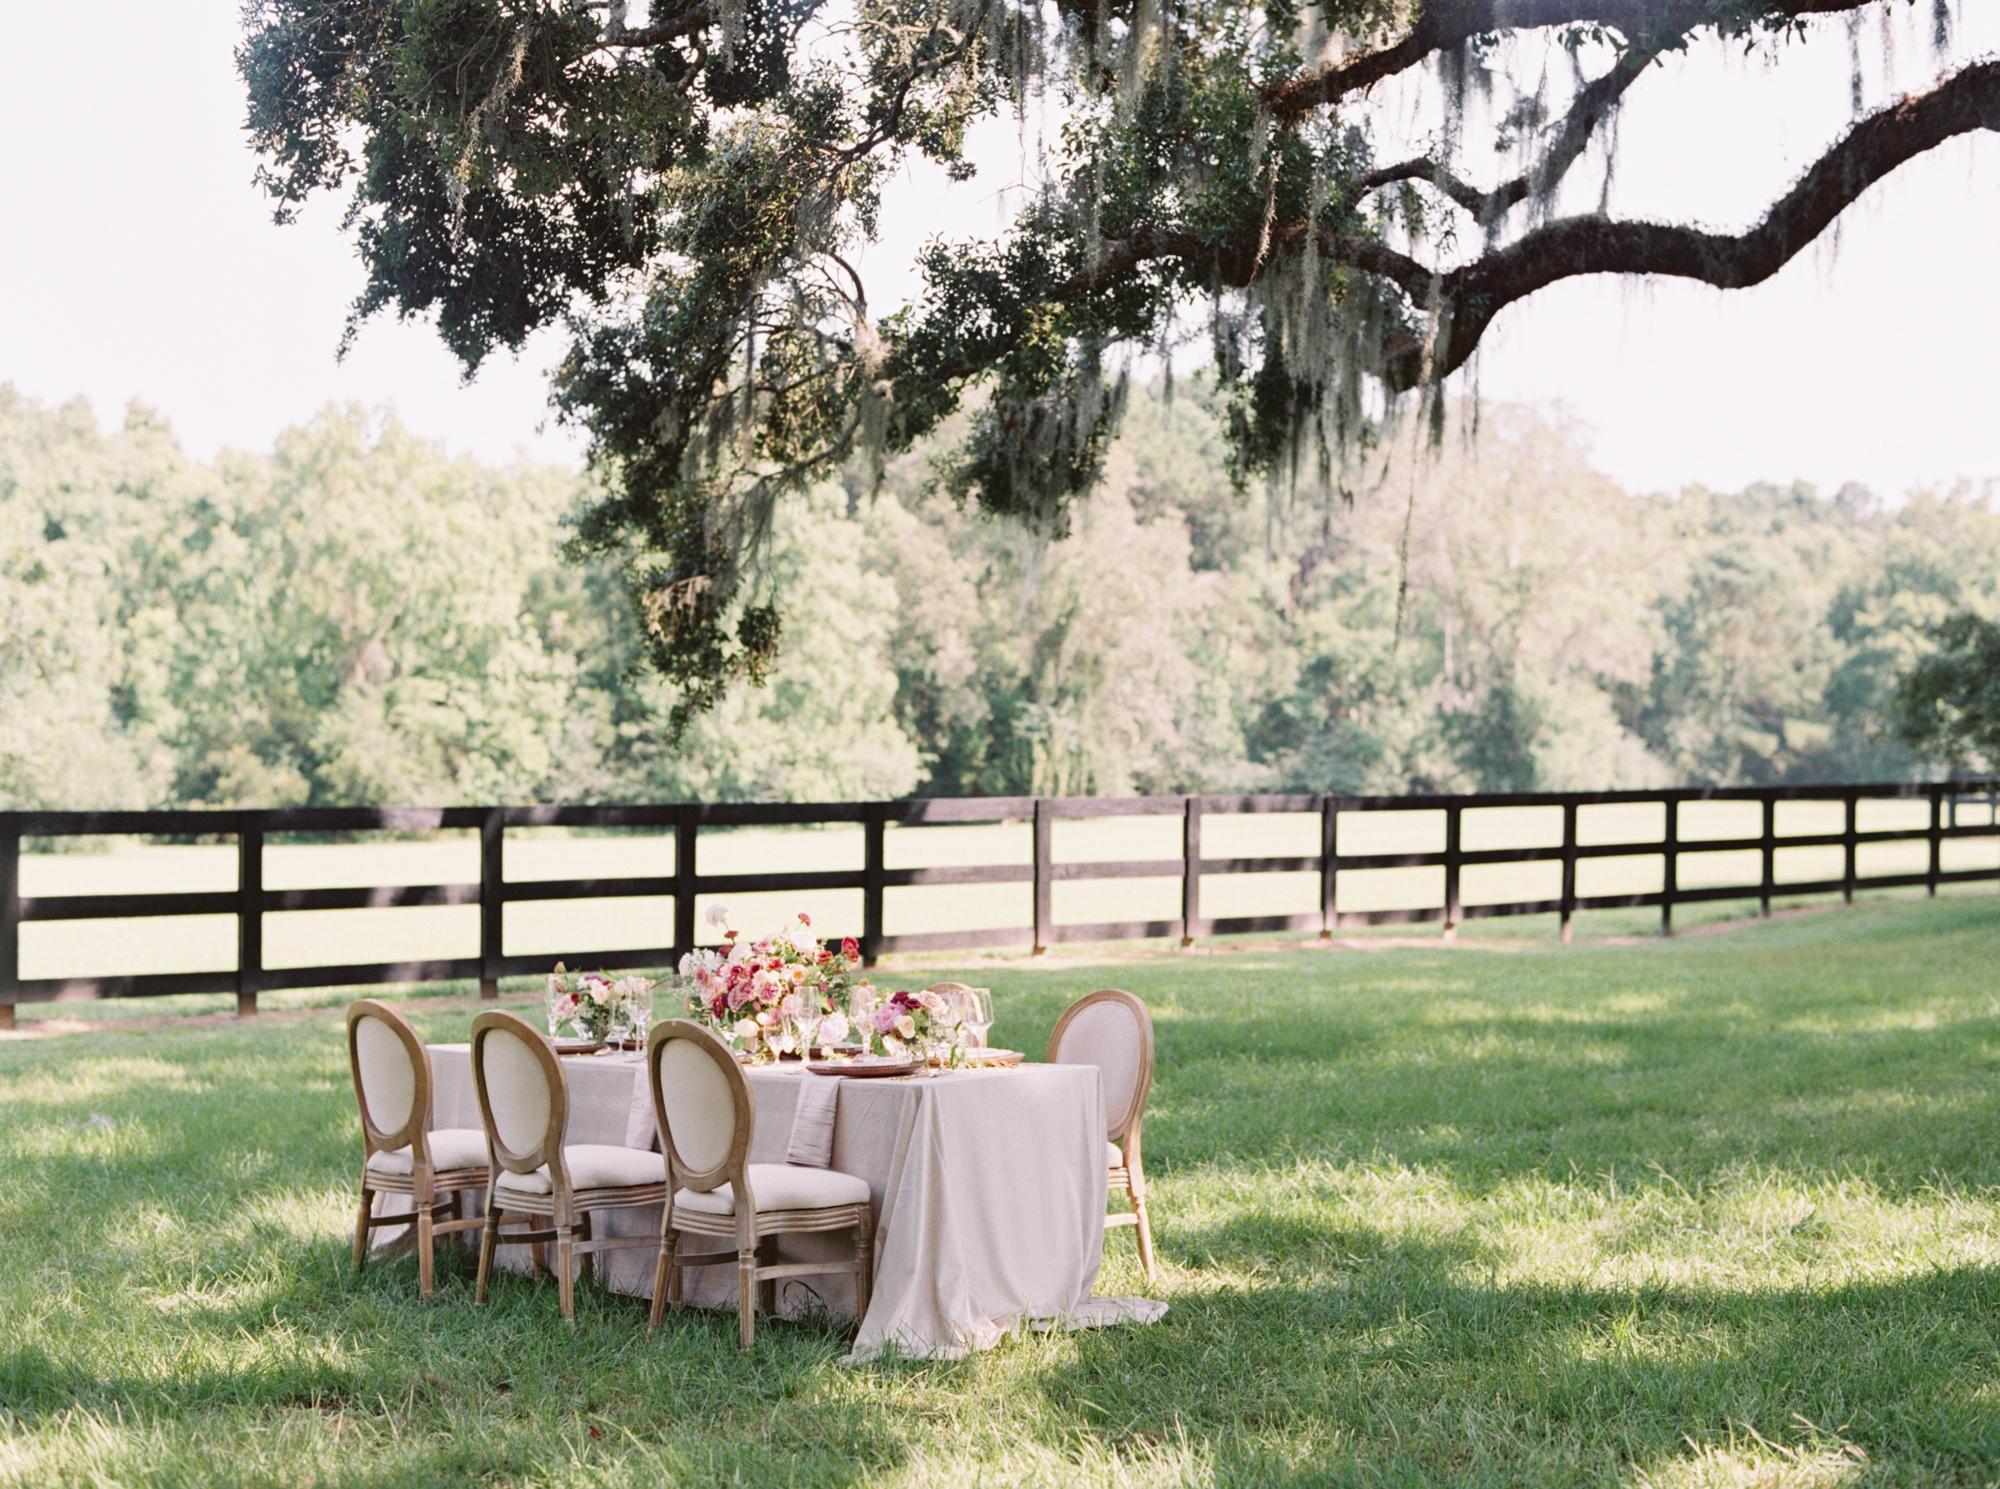 0010_CourtneyHansonPhotography_Boone_Hall_Plantation_Wedding-14.jpg